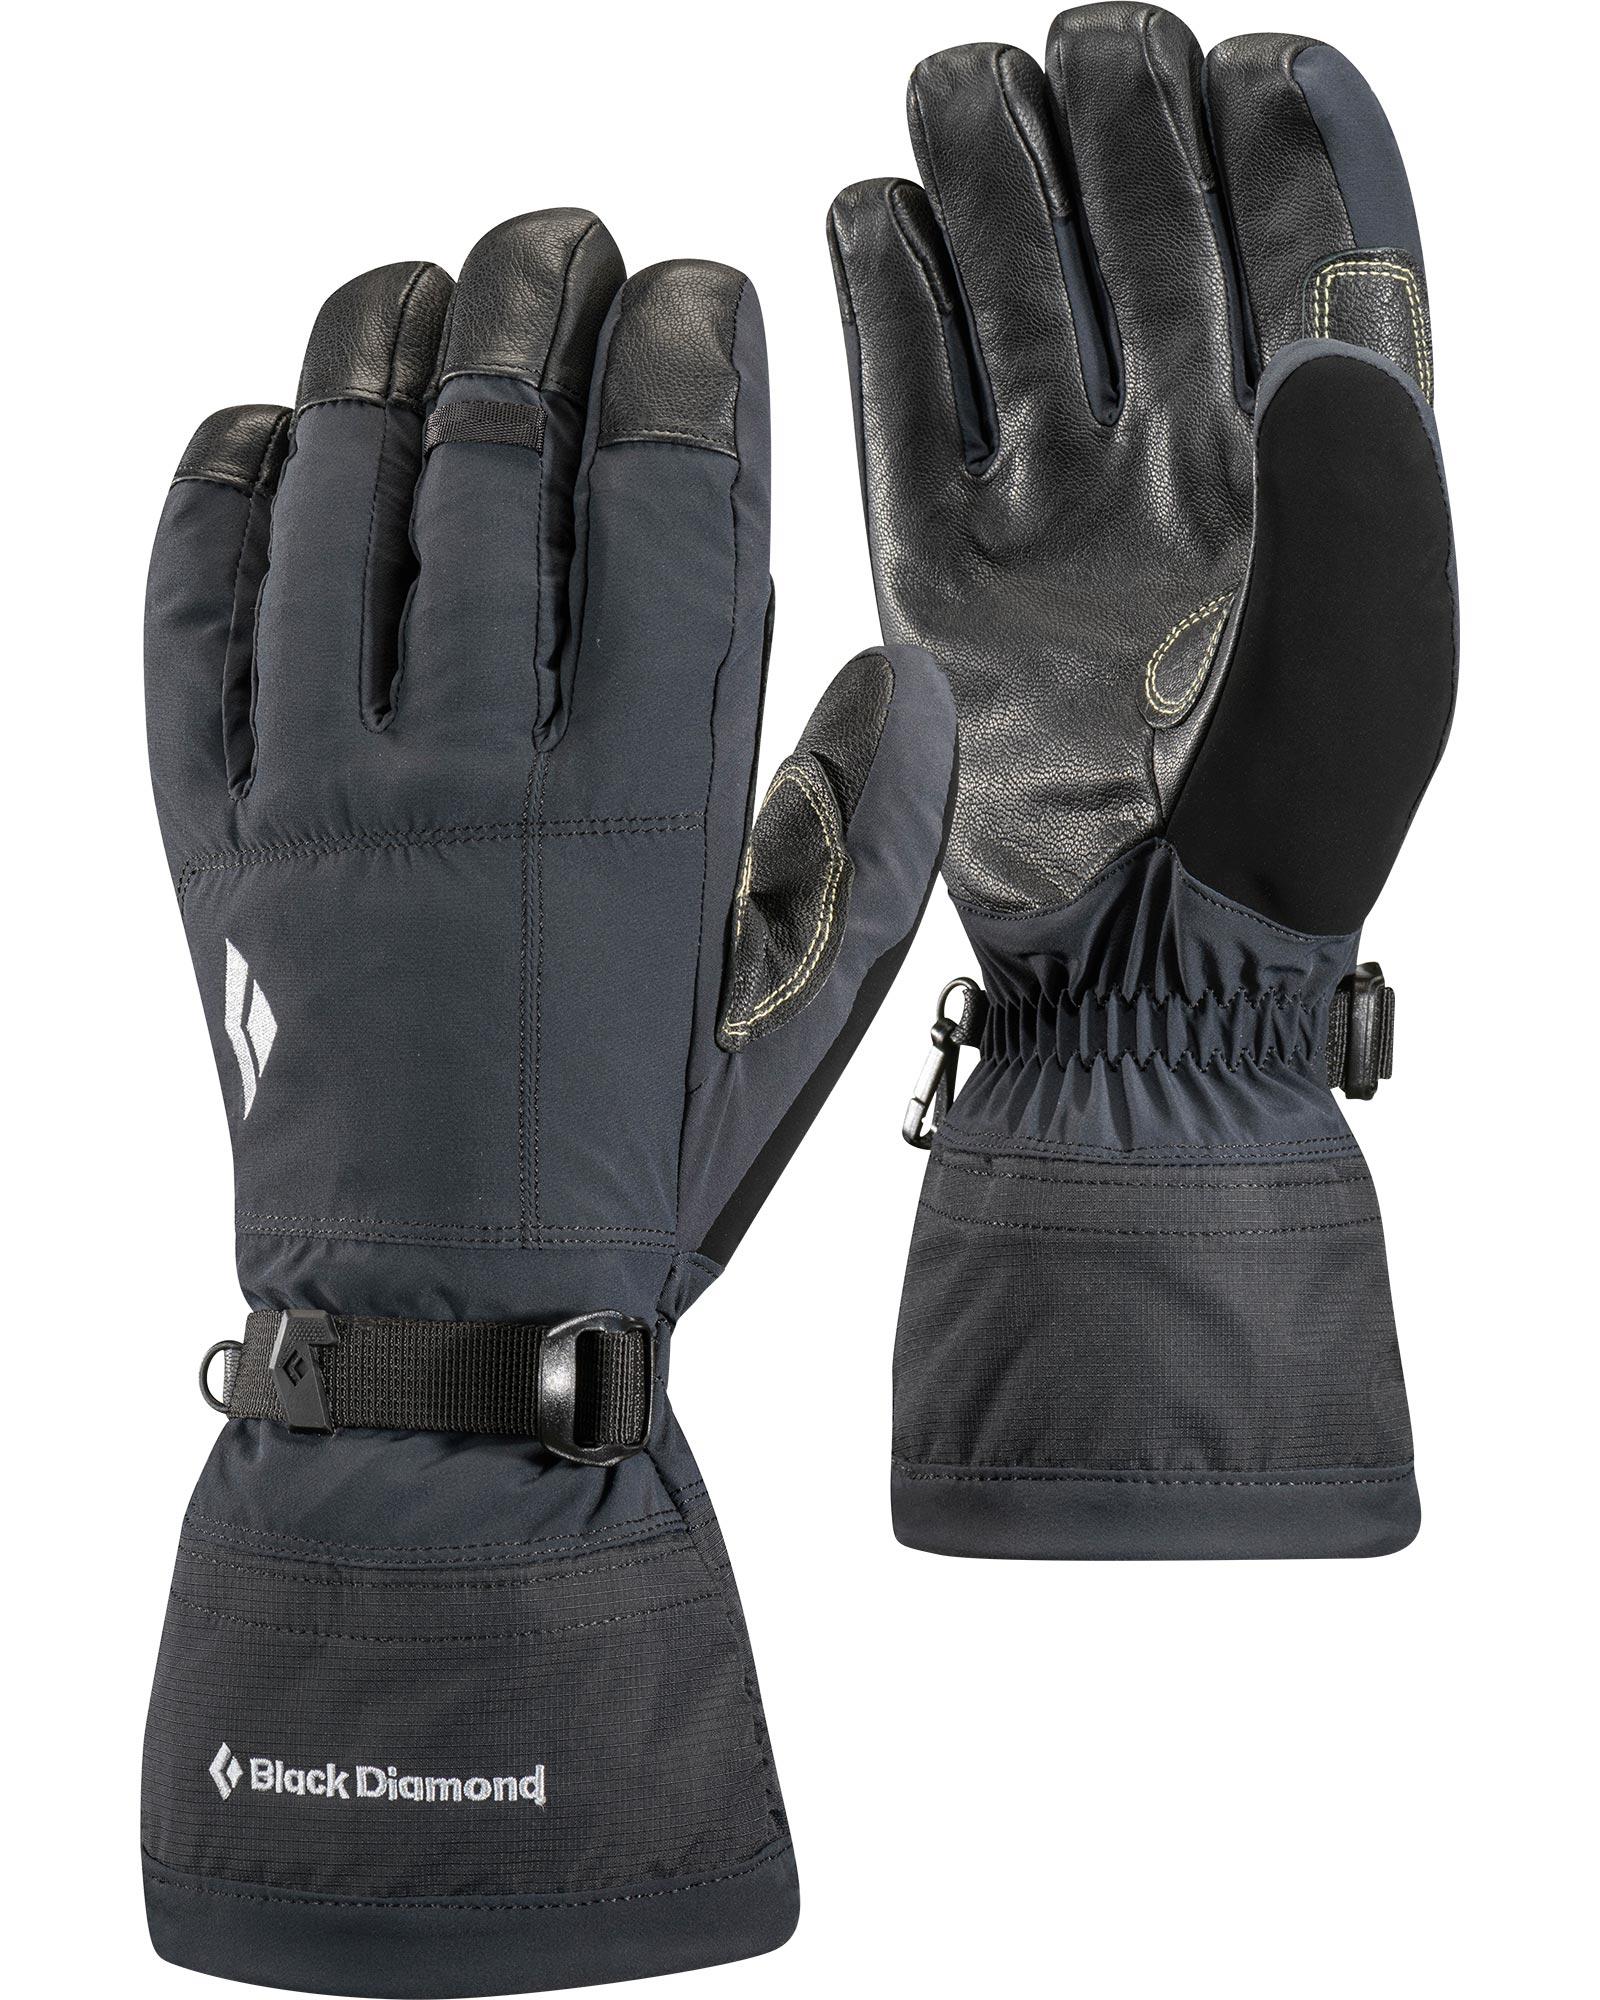 Black Diamond Soloist Gloves 0